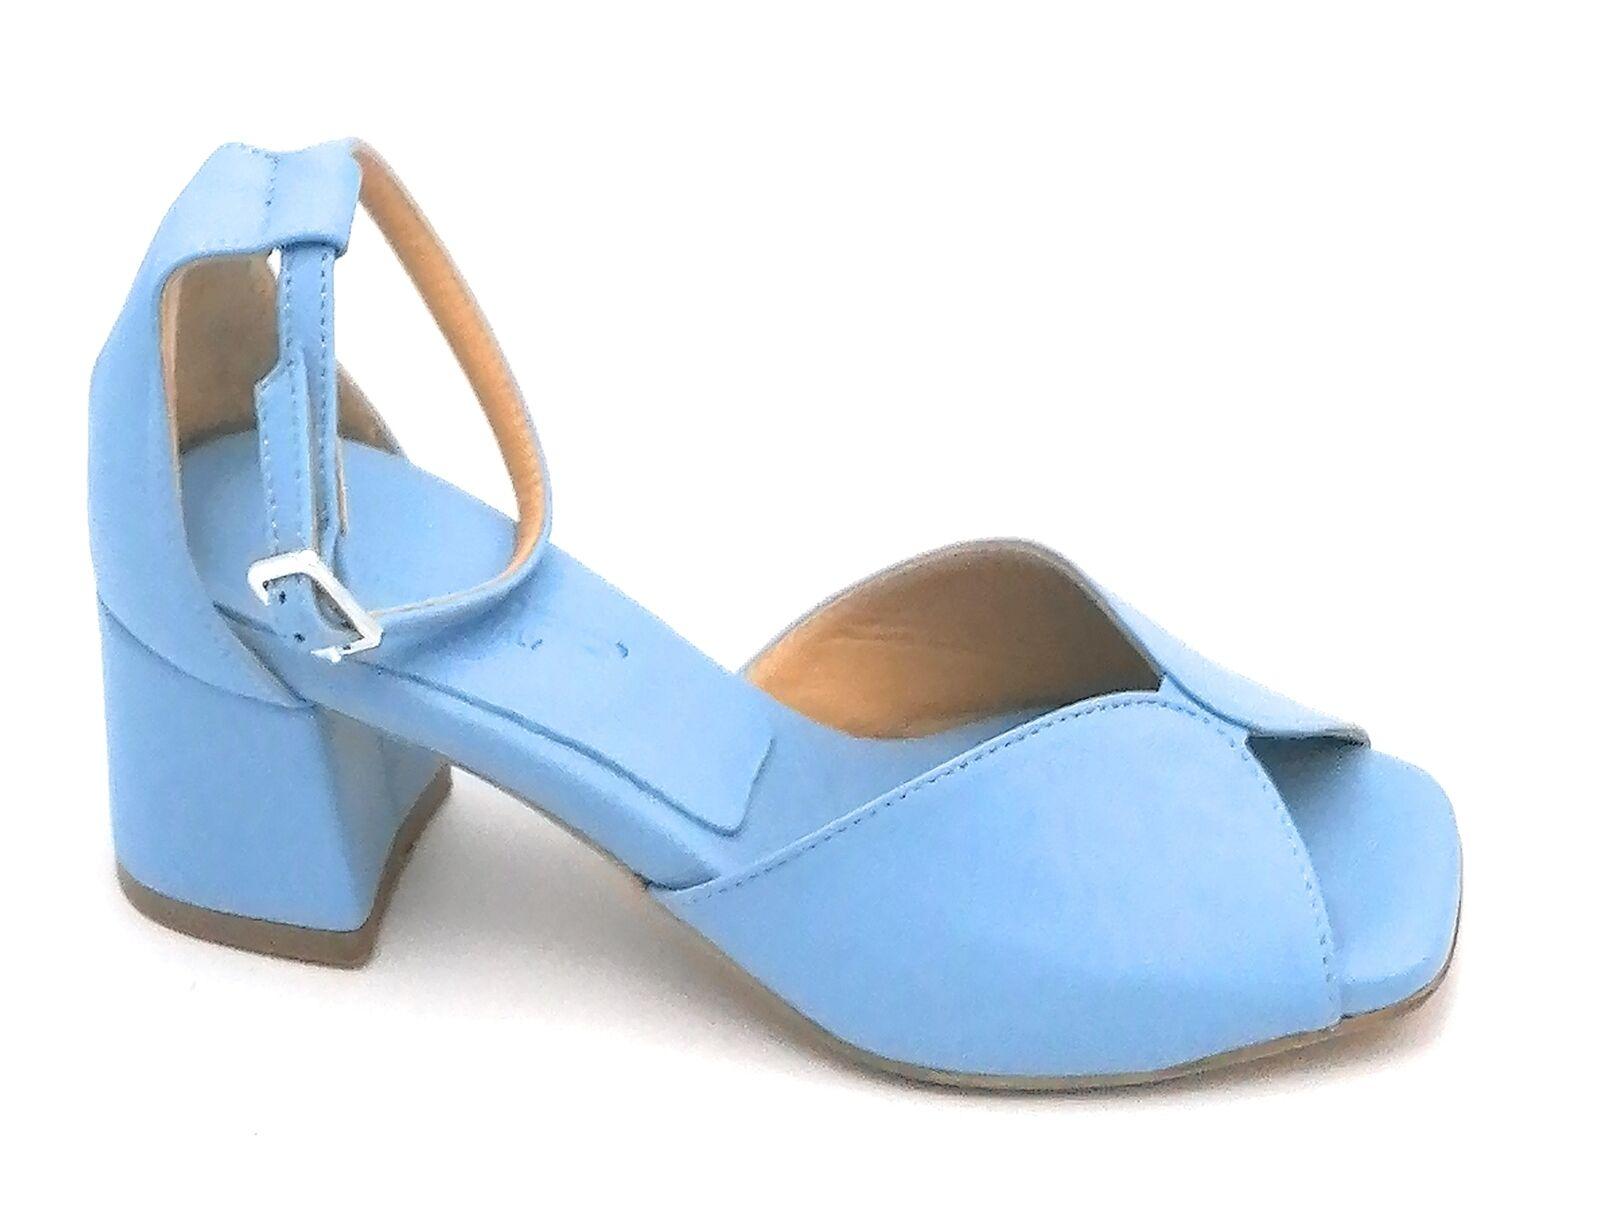 Oroscuro Bella Sandale Cuir Bleu Courroie de Cheville Talon Largo 5cm U